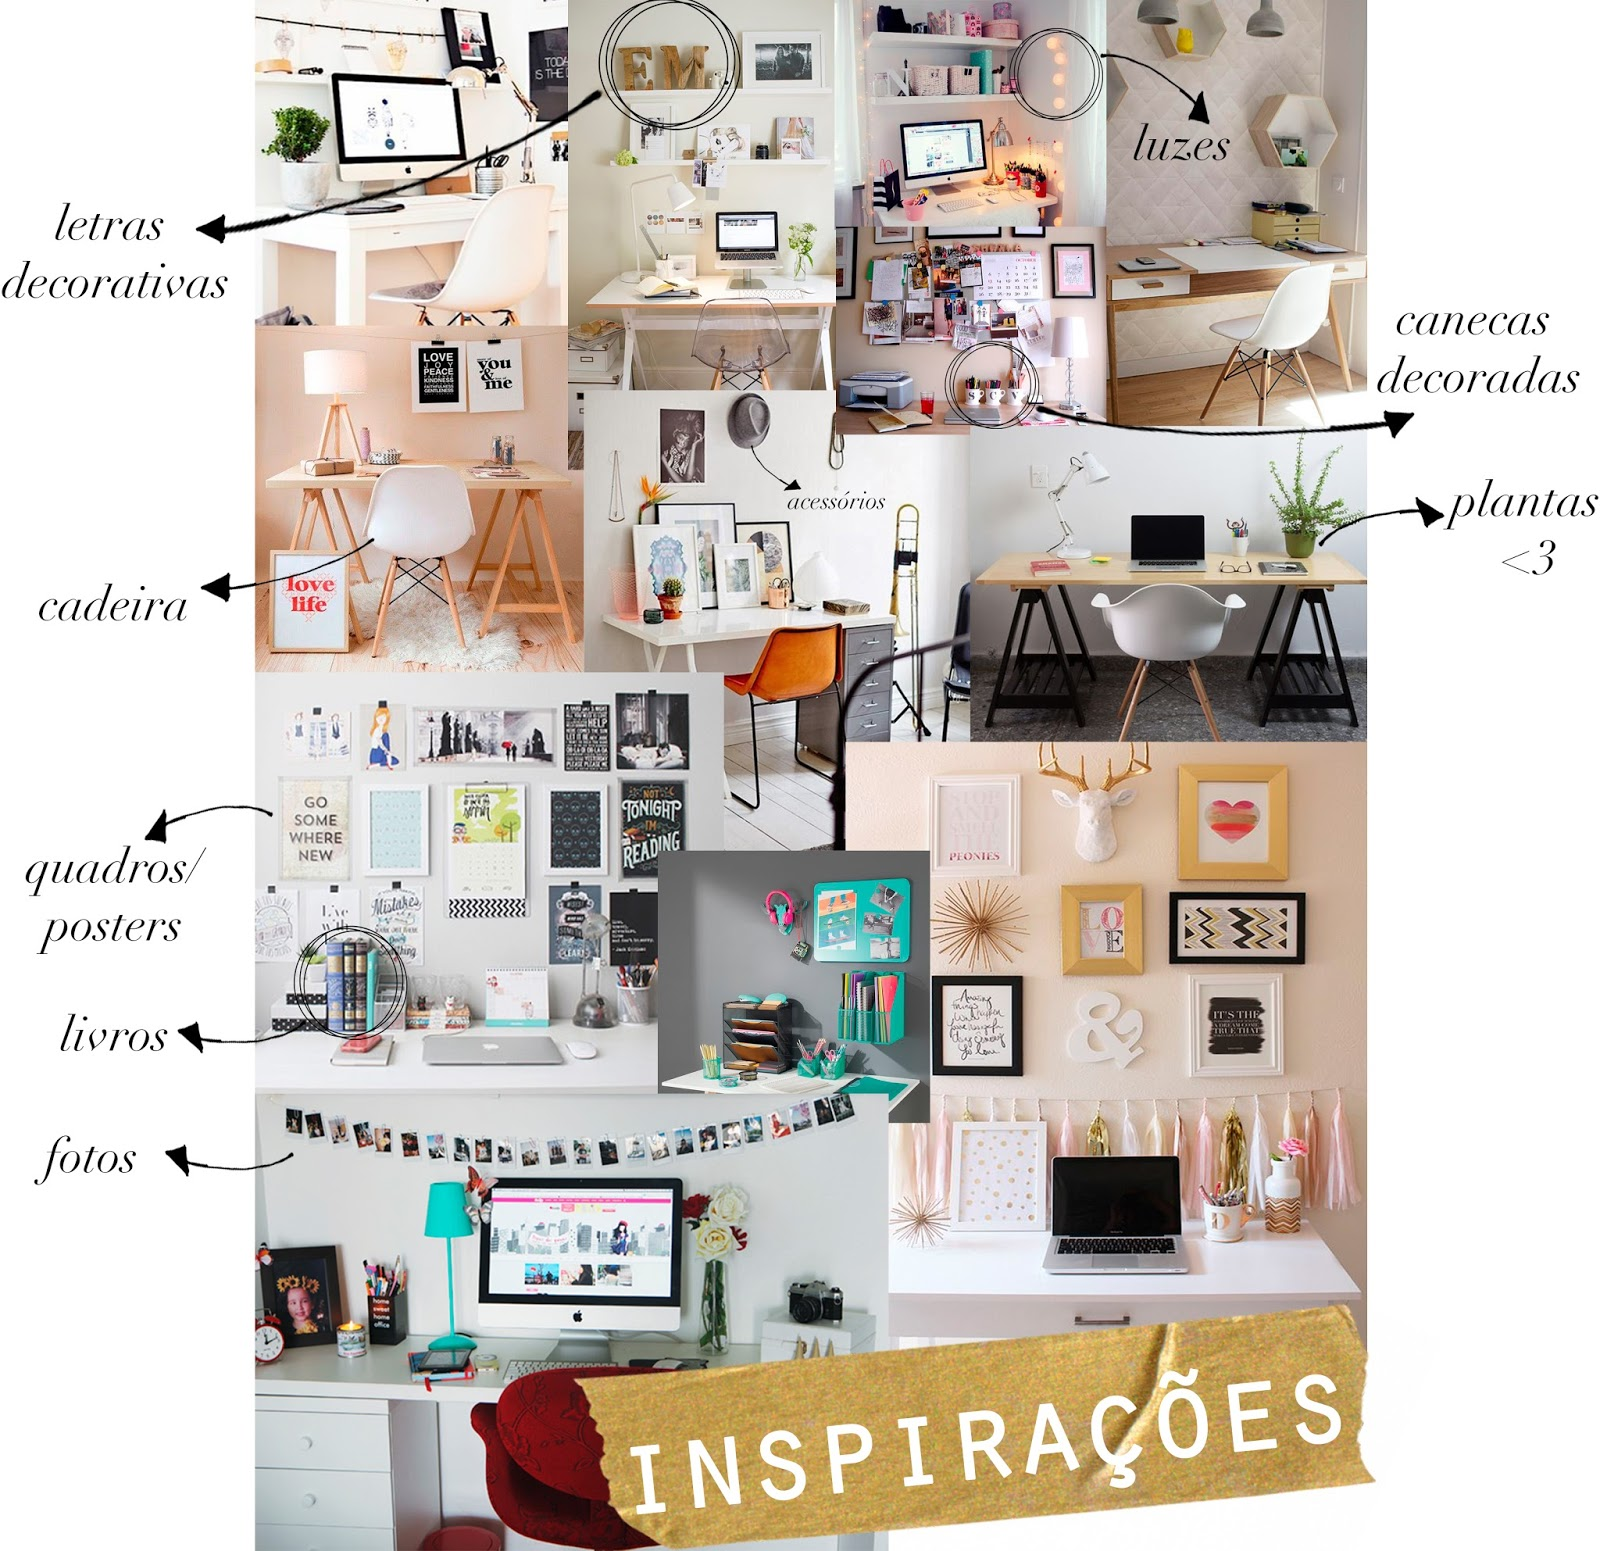 projeto-decoracao-montando-seu-home-office-nicolymillanez (2)